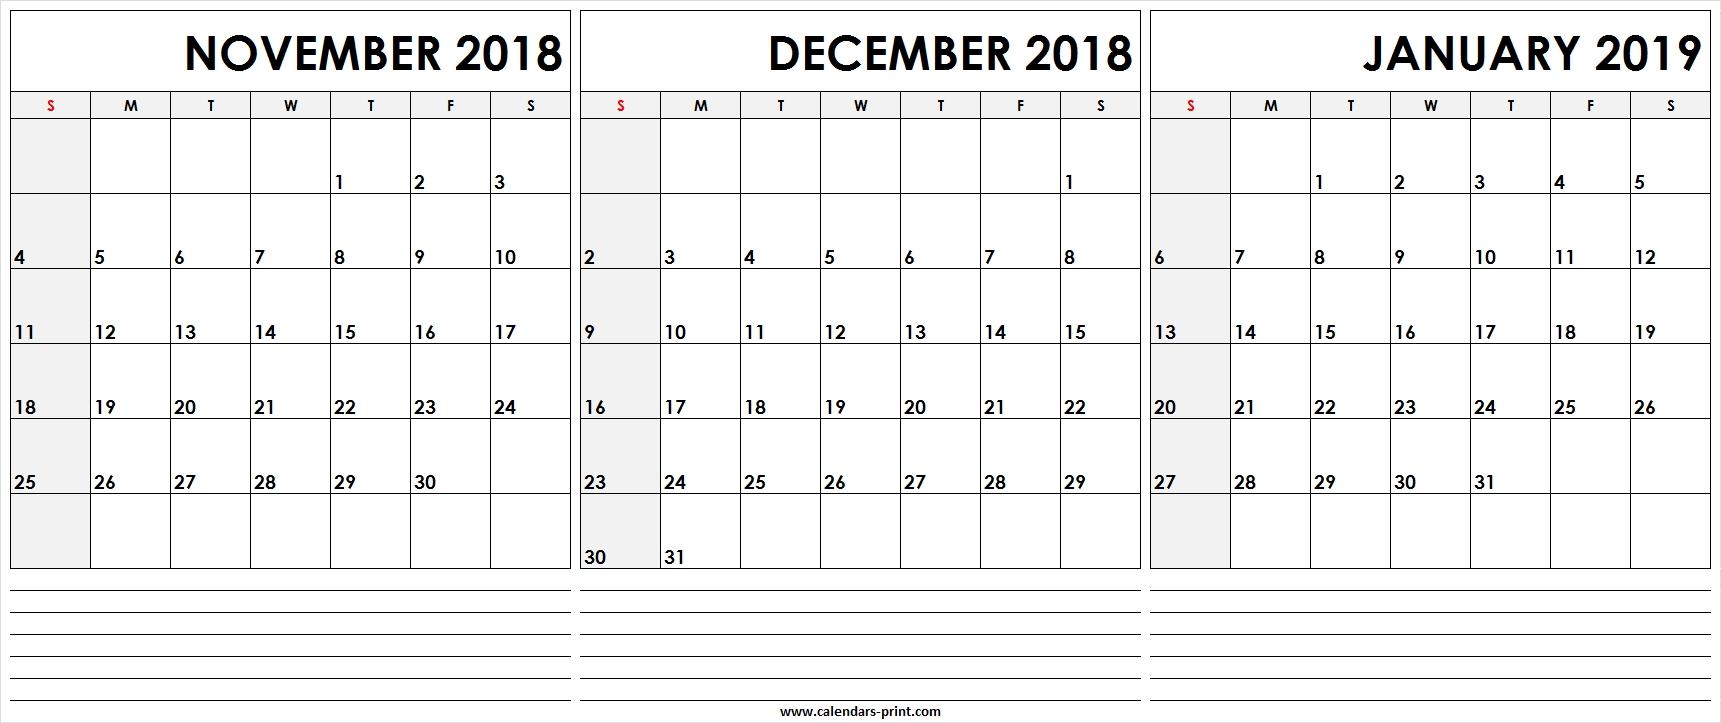 Print Calendar November December January   Calendar throughout Free Printable December January Calendar